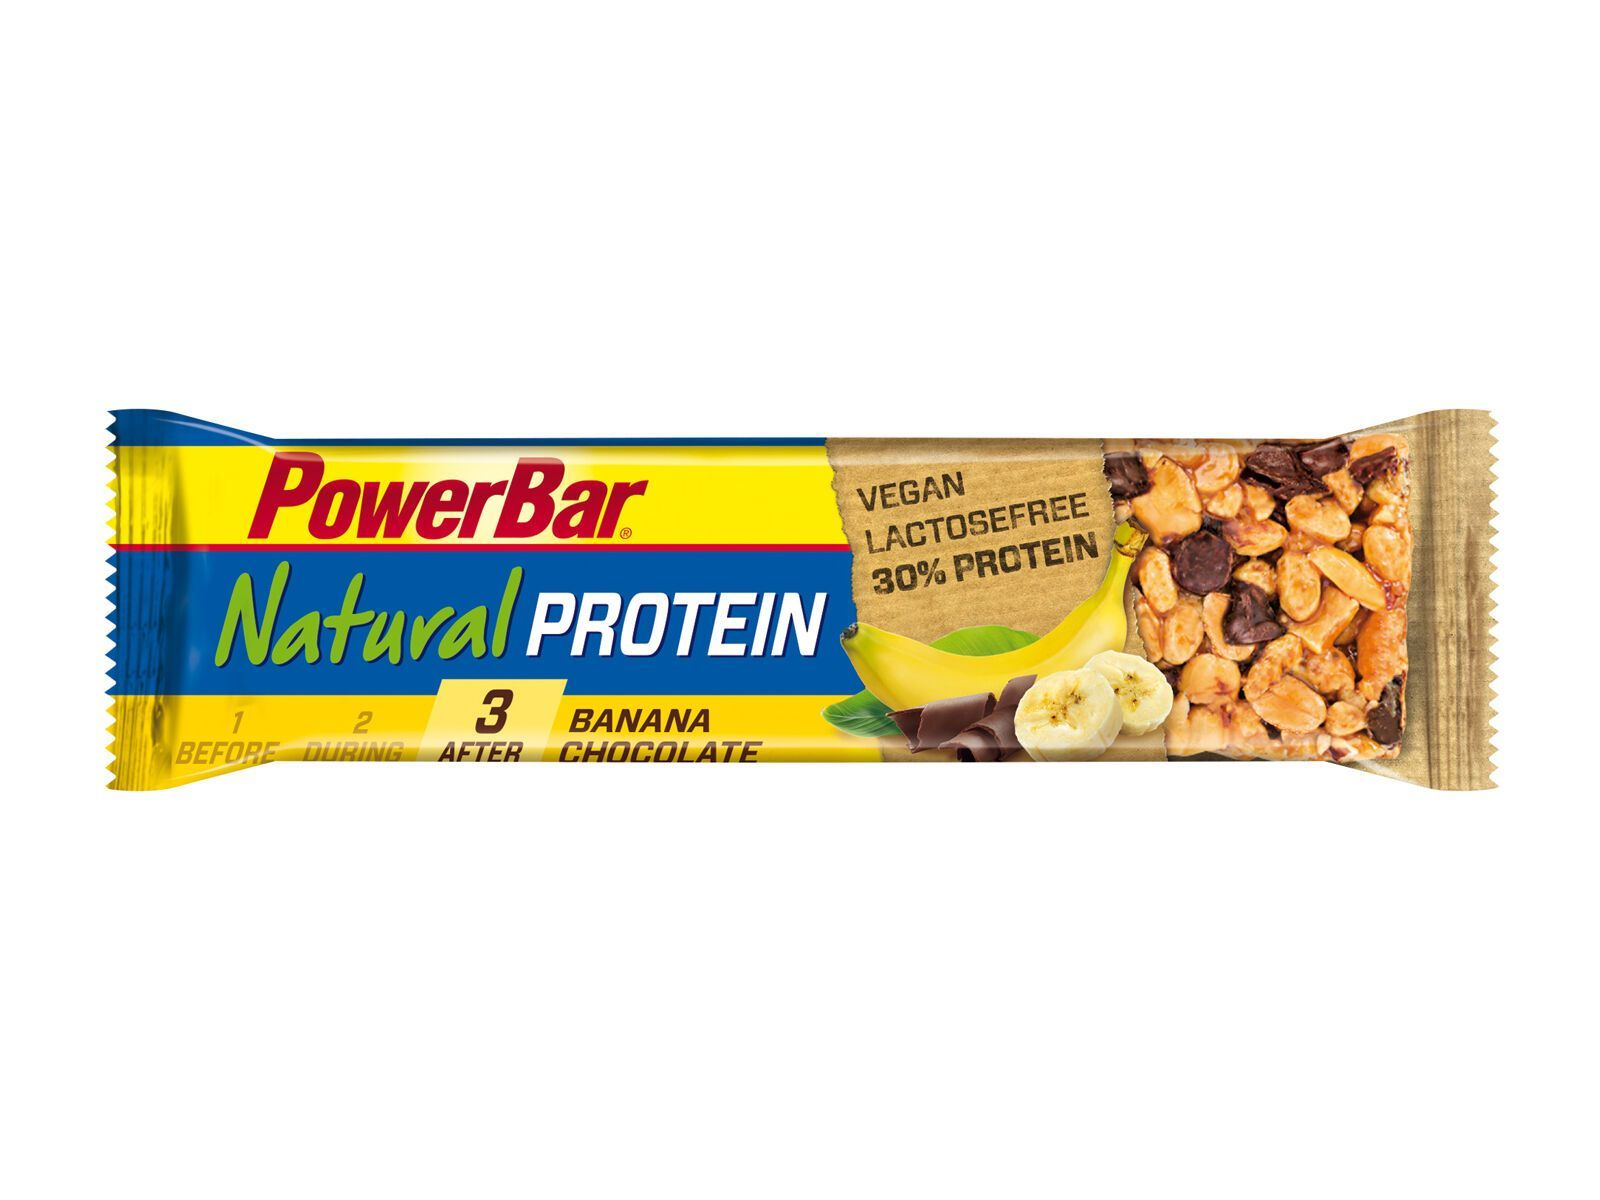 PowerBar Natural Protein (Vegan) - Banana Chocolate - Proteinriegel 21570400